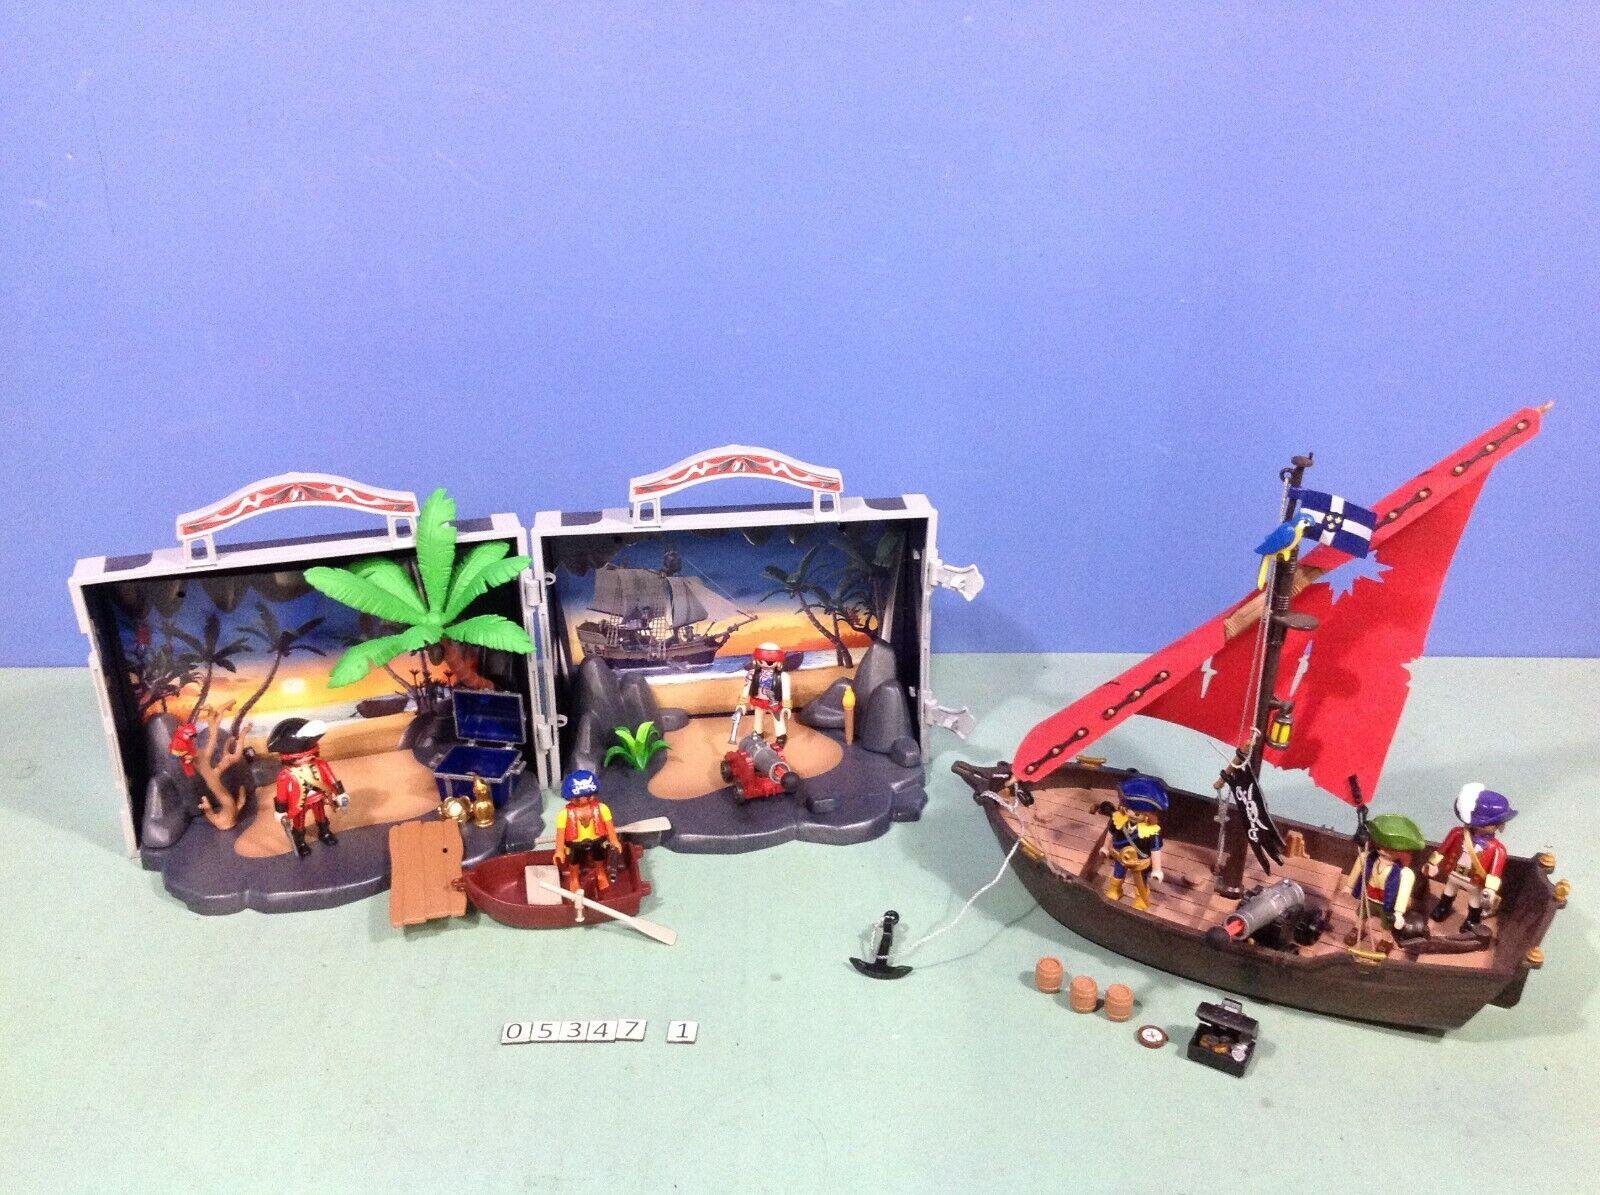 (O5347.1) playmobil Coffret pirates transportable ref 5347 + bateau ref 4444